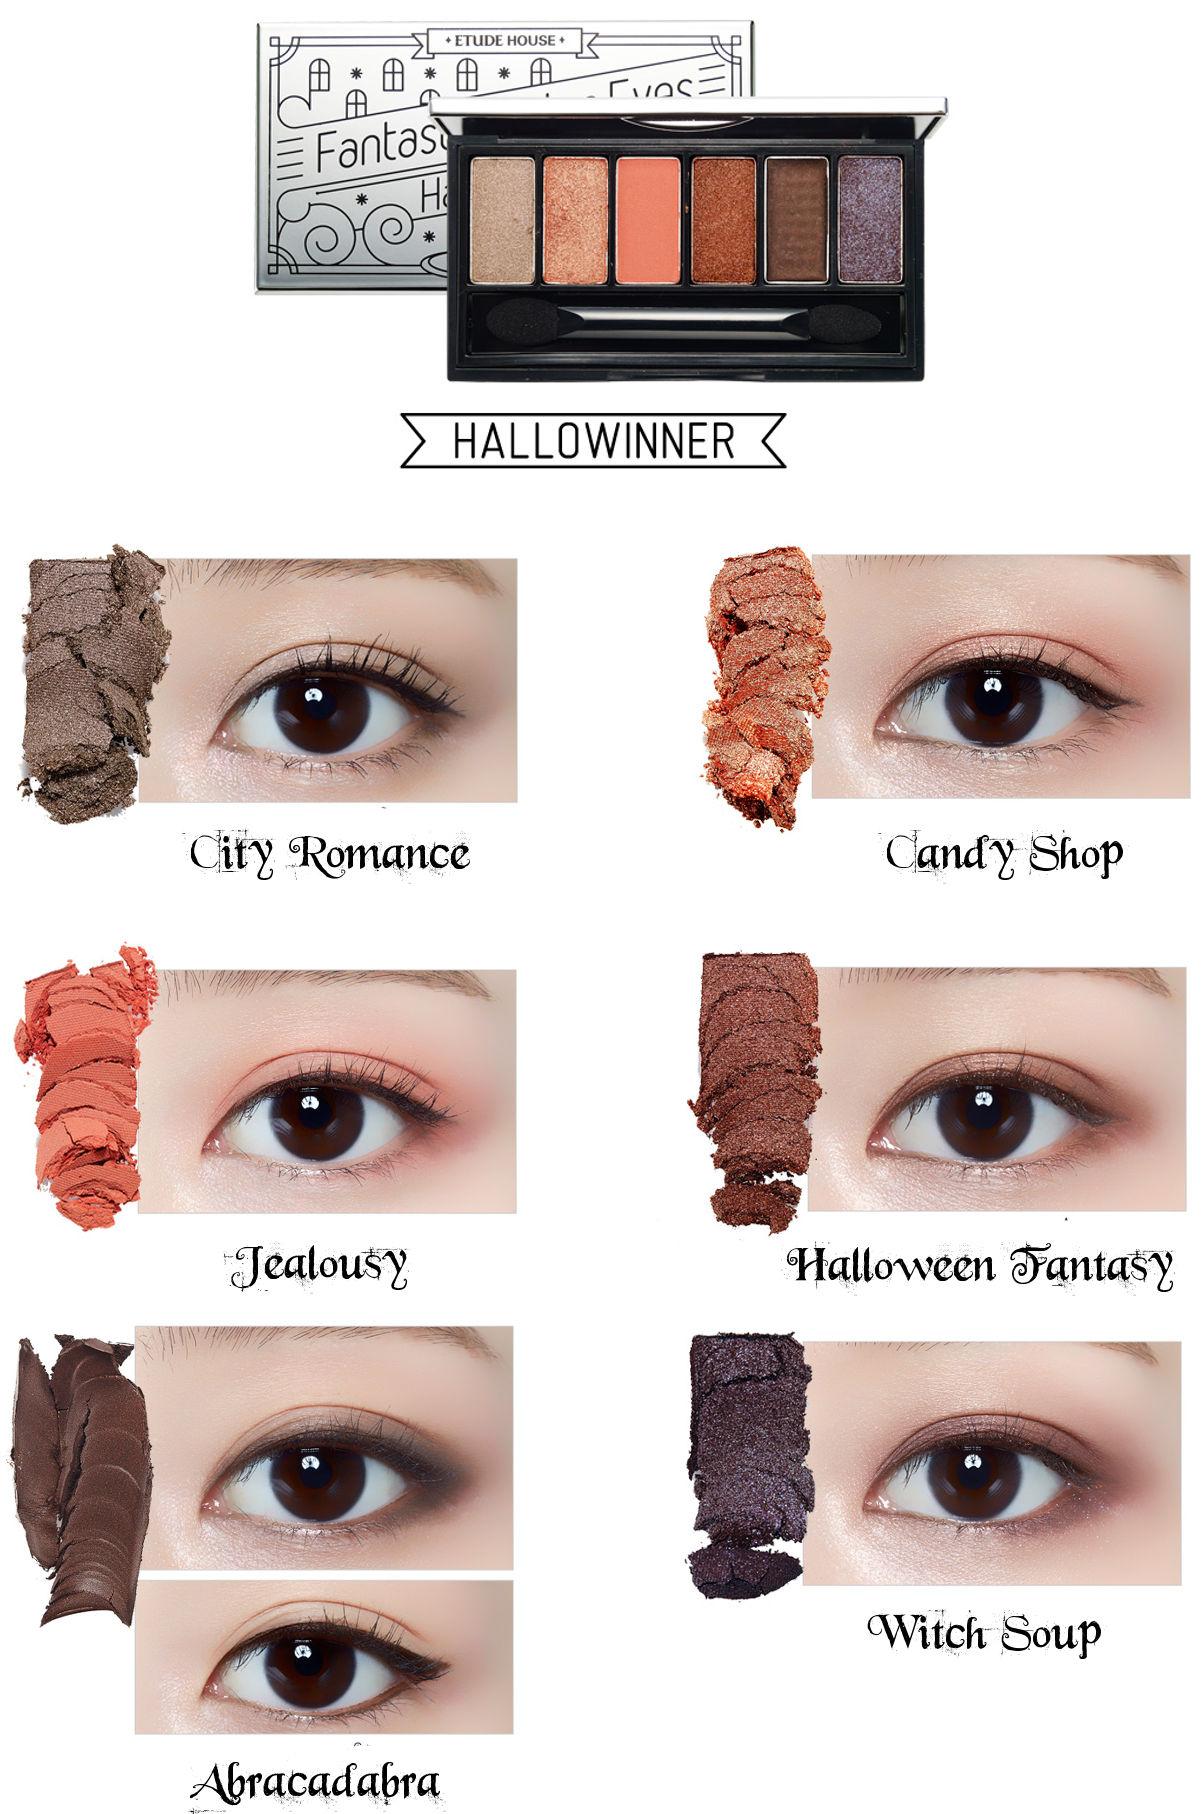 Etude House Halloween Fantastic Color Eyes Hallowinner